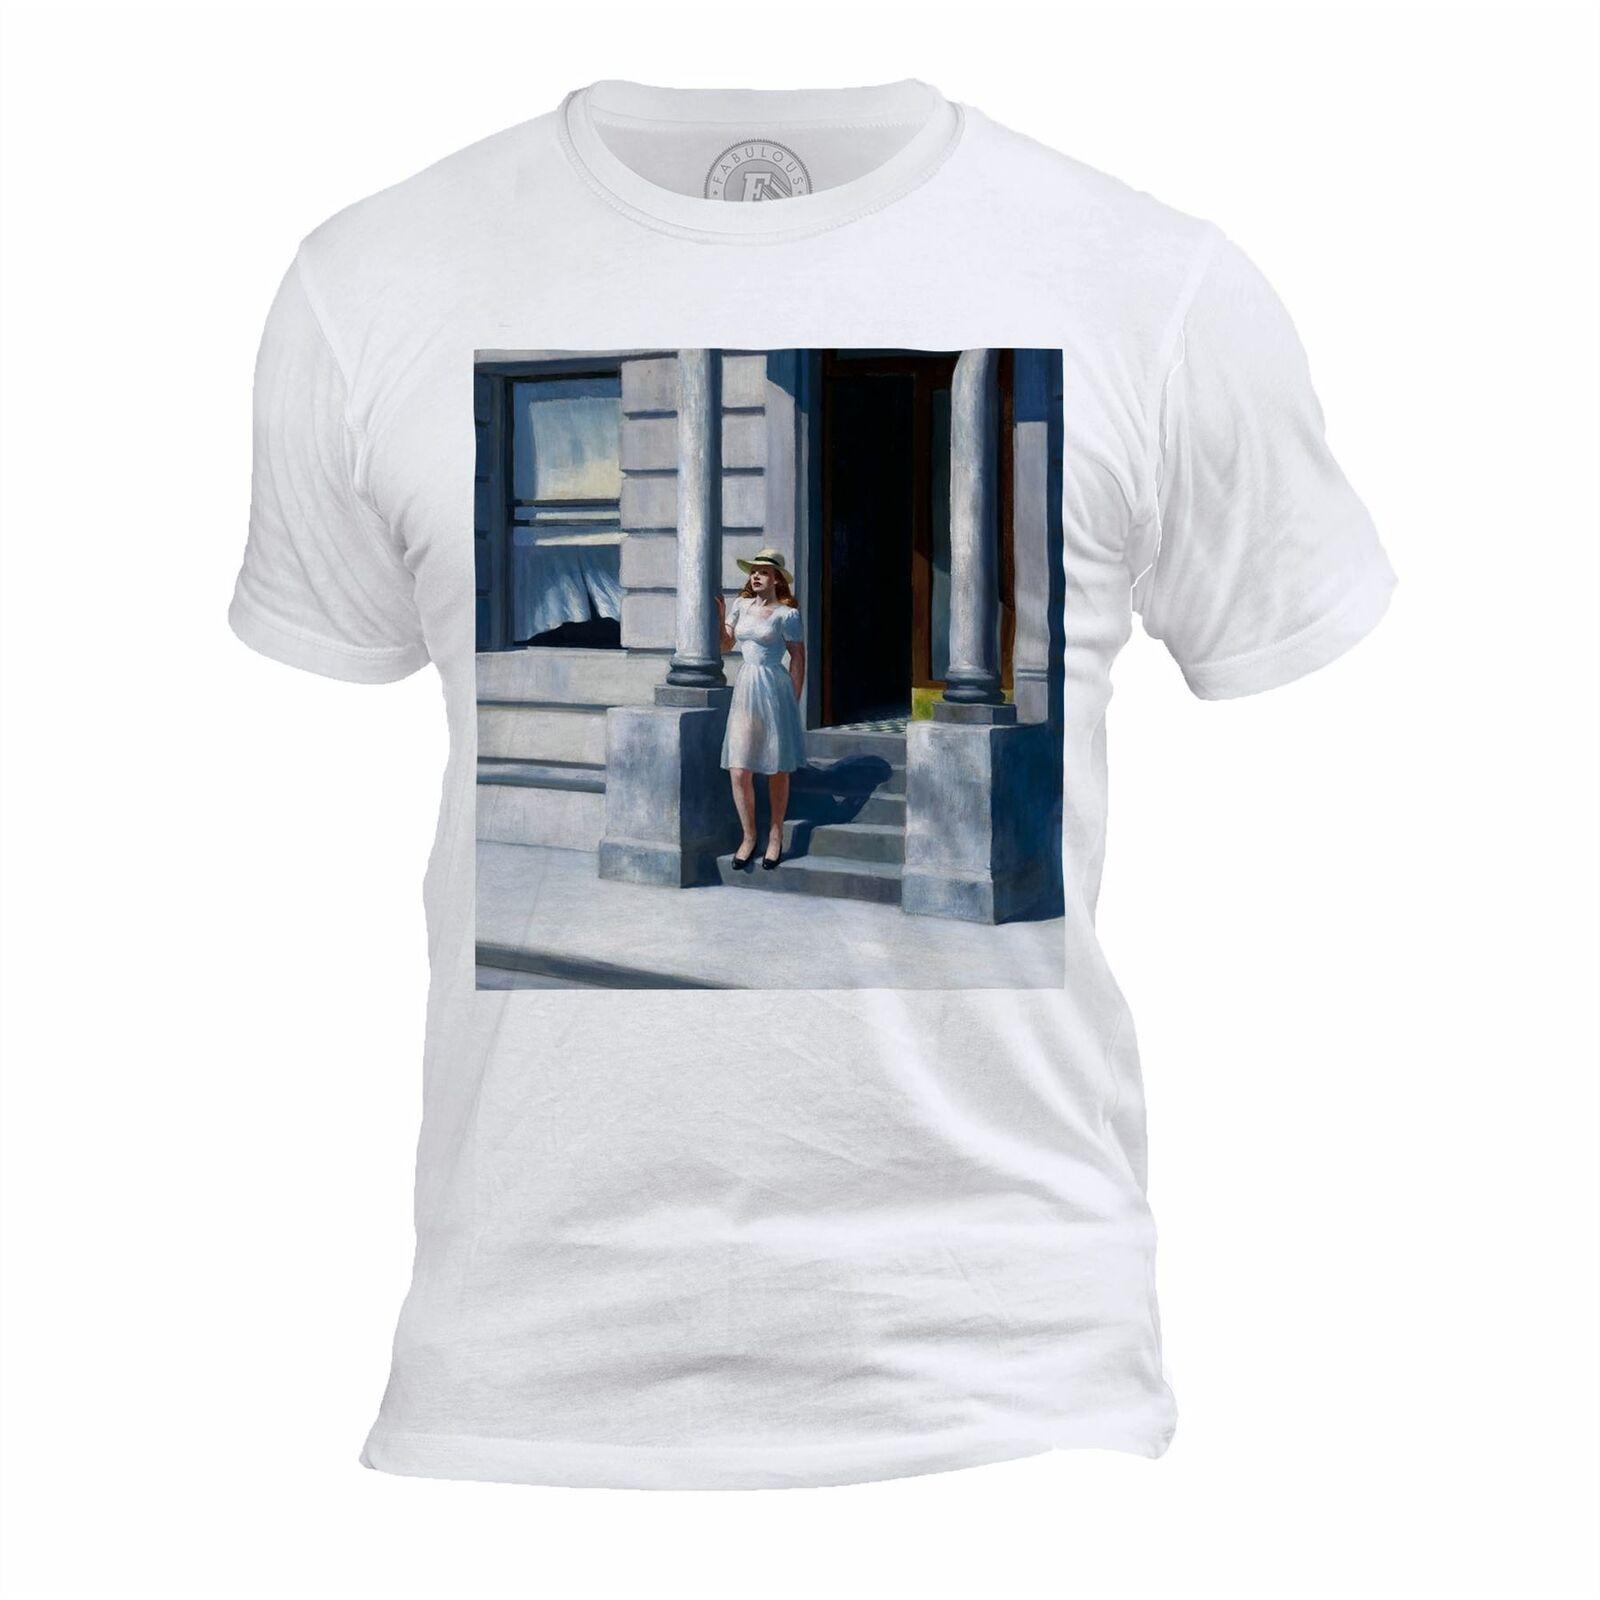 T camisa Homme Col Rond verano Edward Hopper Peinture Realisme Amerique